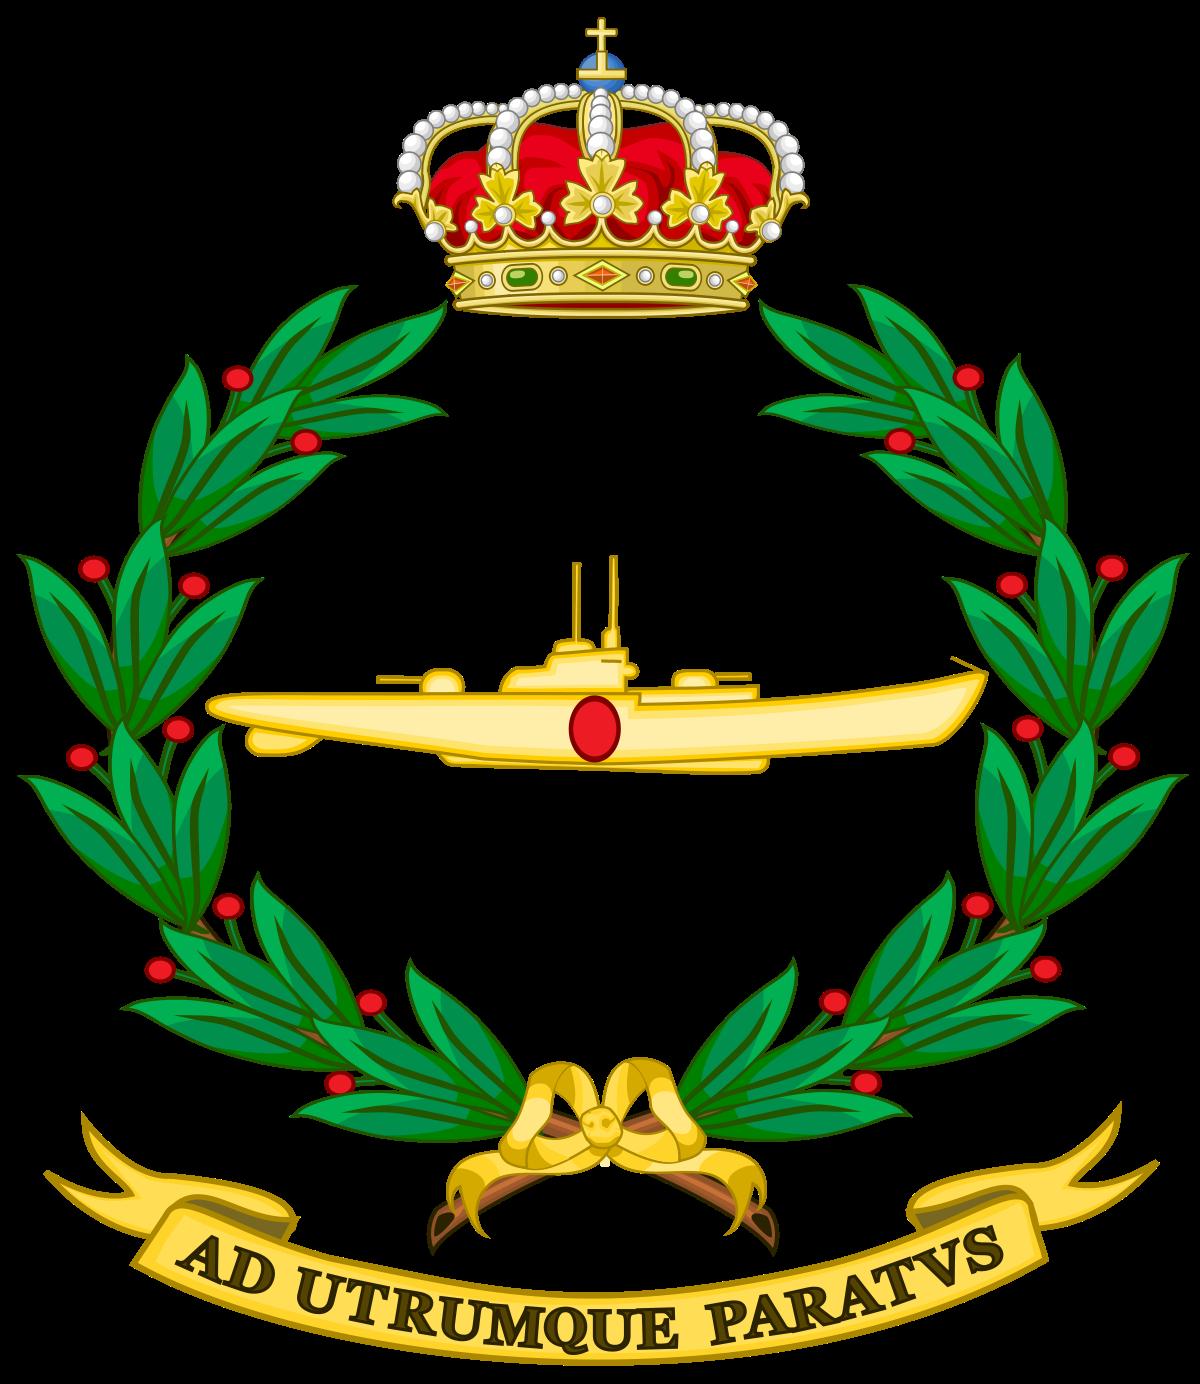 Navy clipart submarine navy. List of submarines the